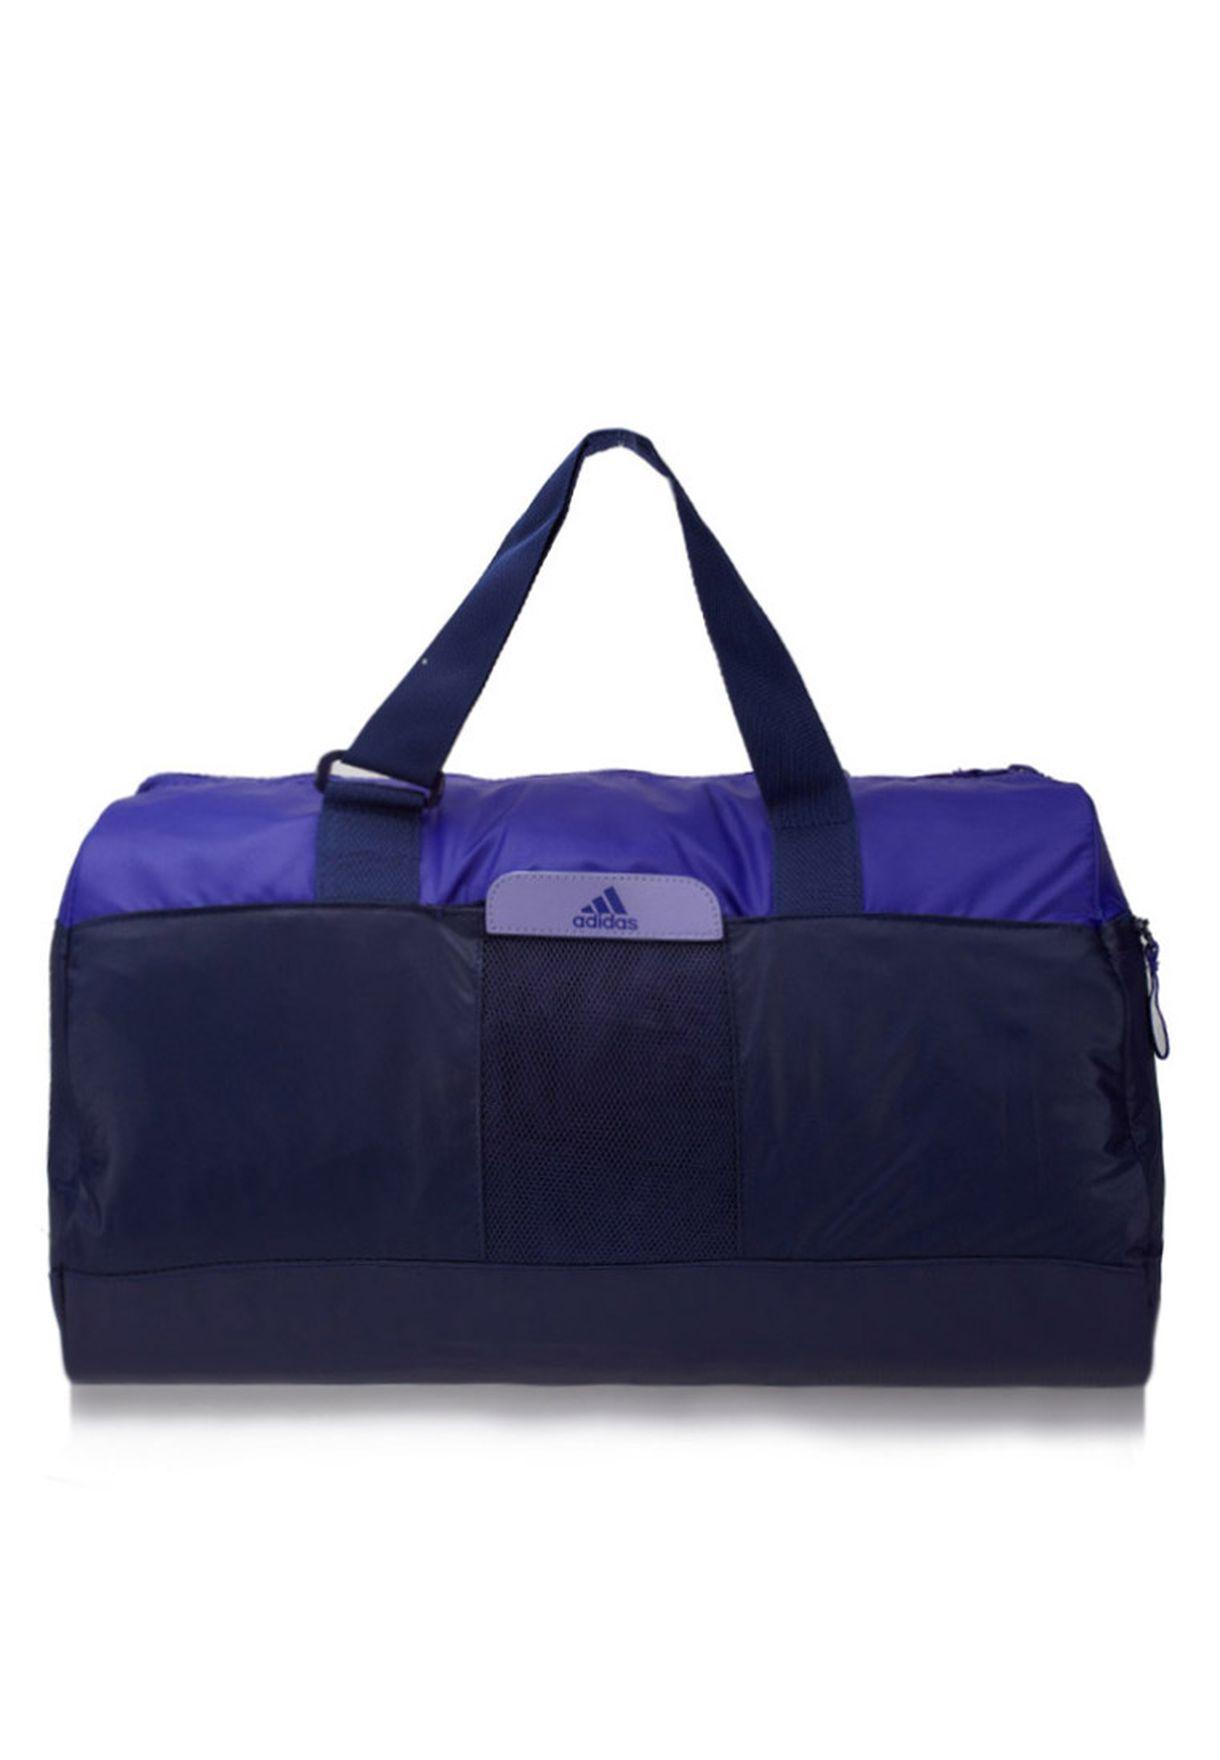 Shop adidas purple Small Duffel Bag S21710 for Women in Bahrain -  AD476AC59IZC 697f5ae698